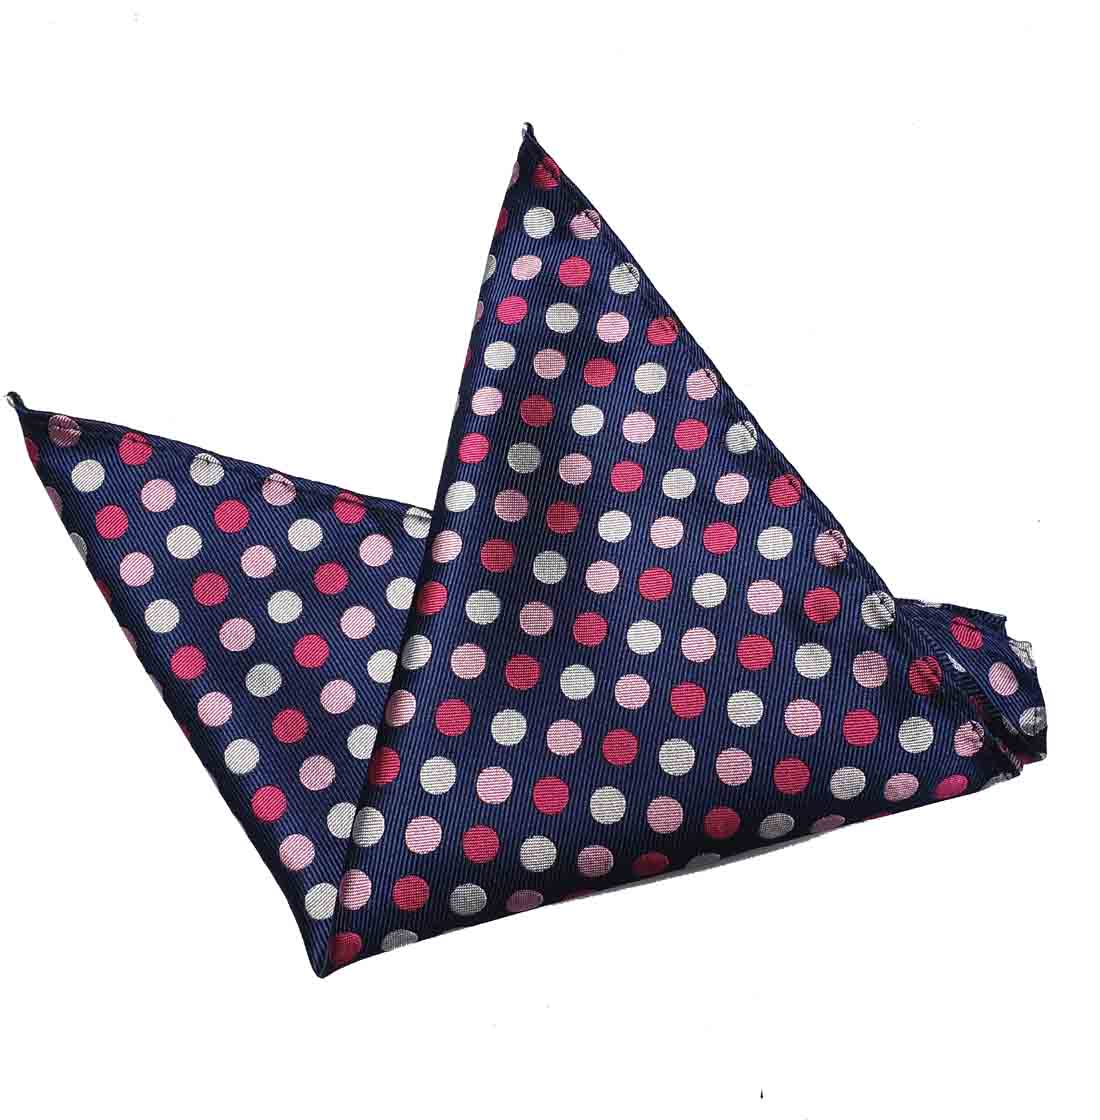 ekSel Pocket Square Navy Blue Pink Gray Polka Dot Men's